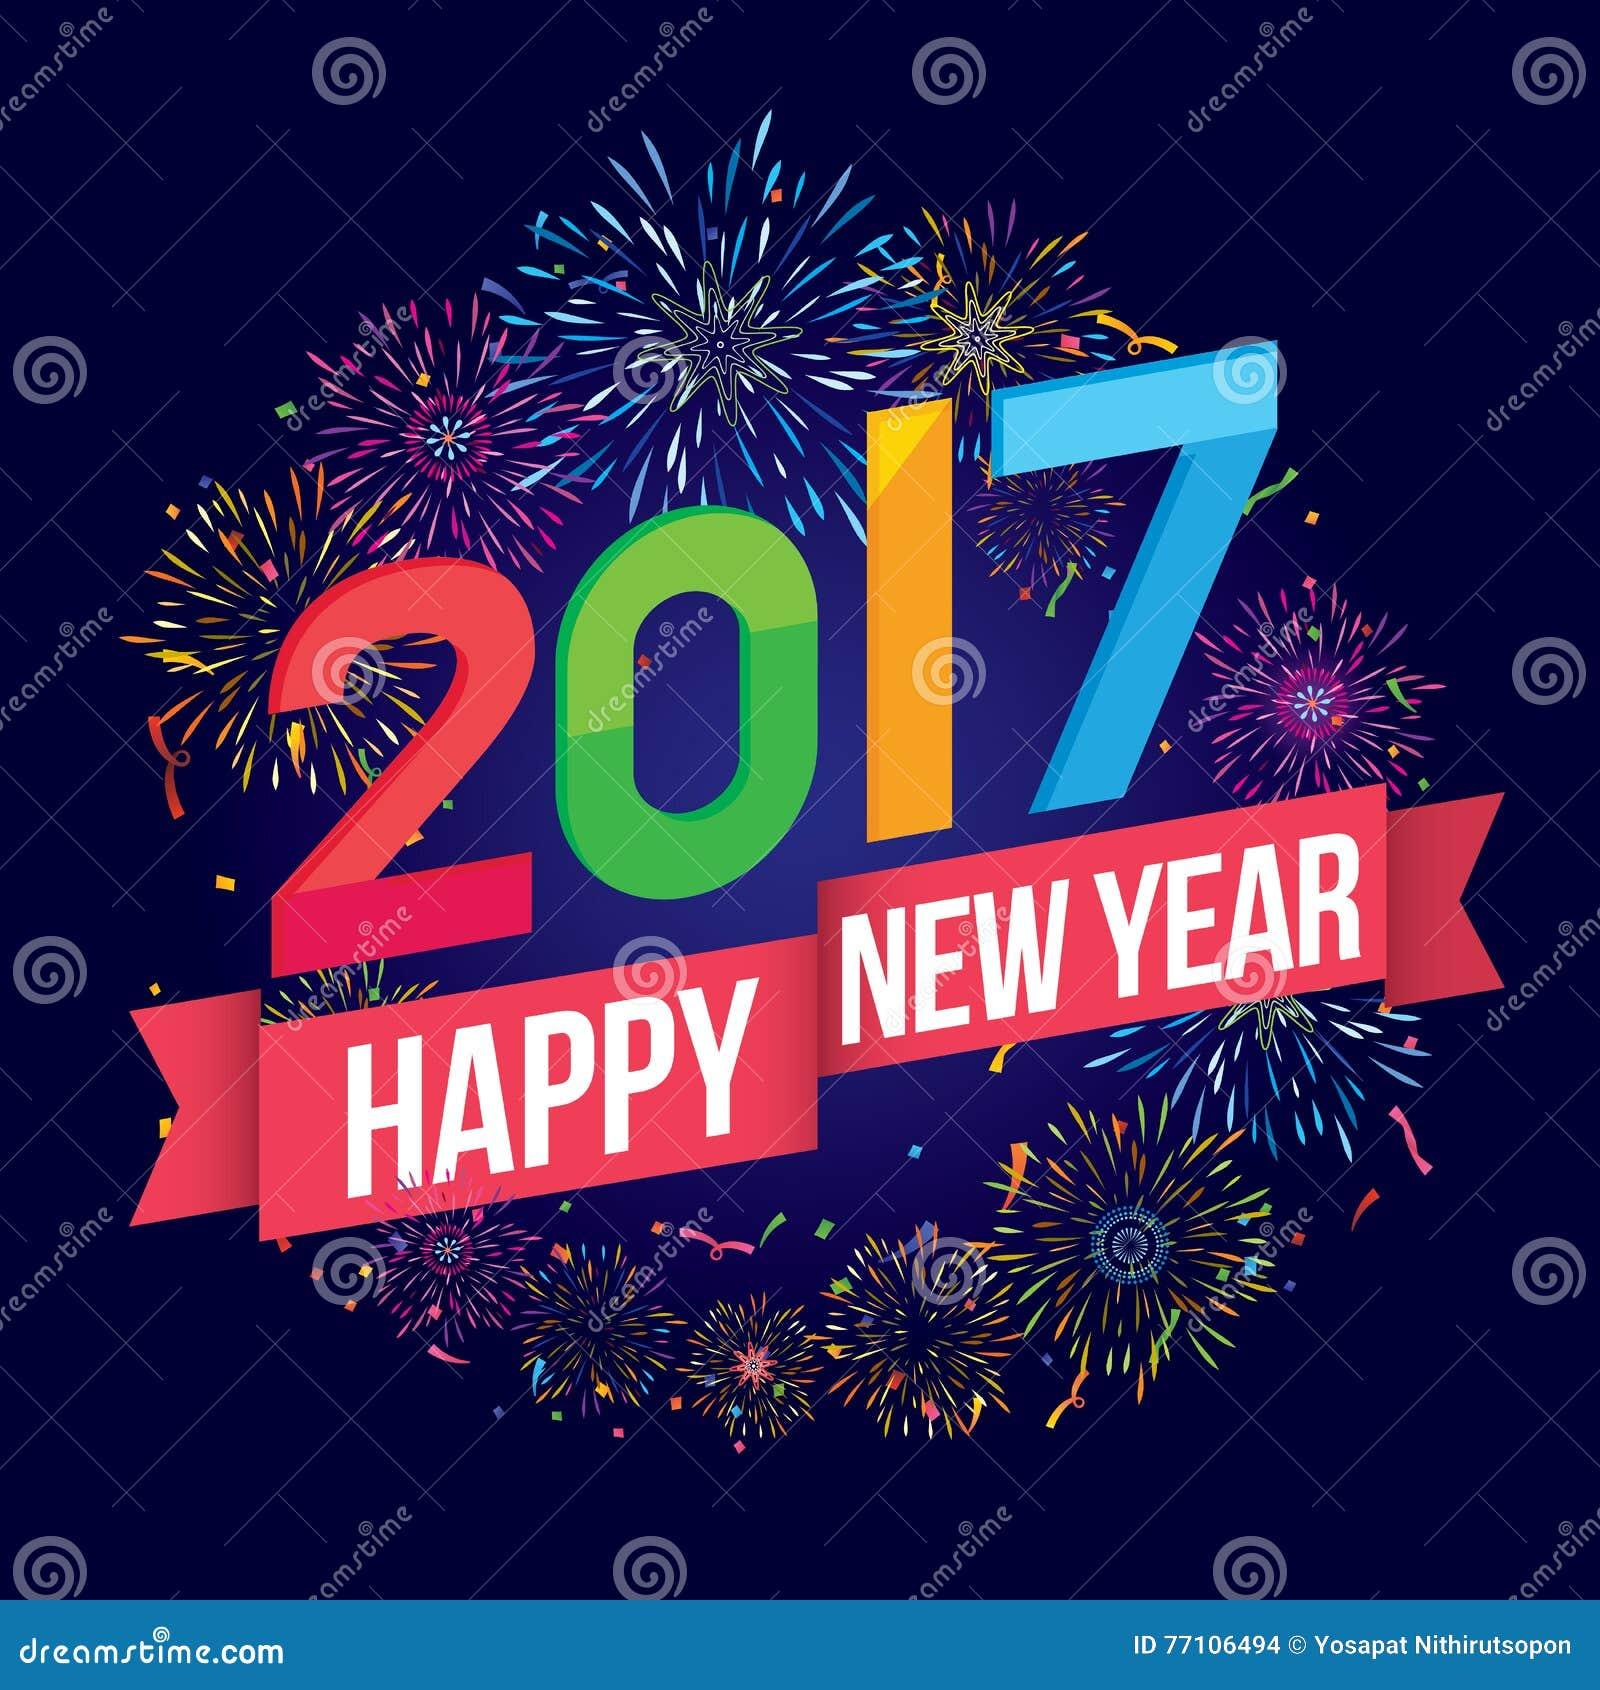 Happy New Year 2017 Stock Vector - Image: 77106494